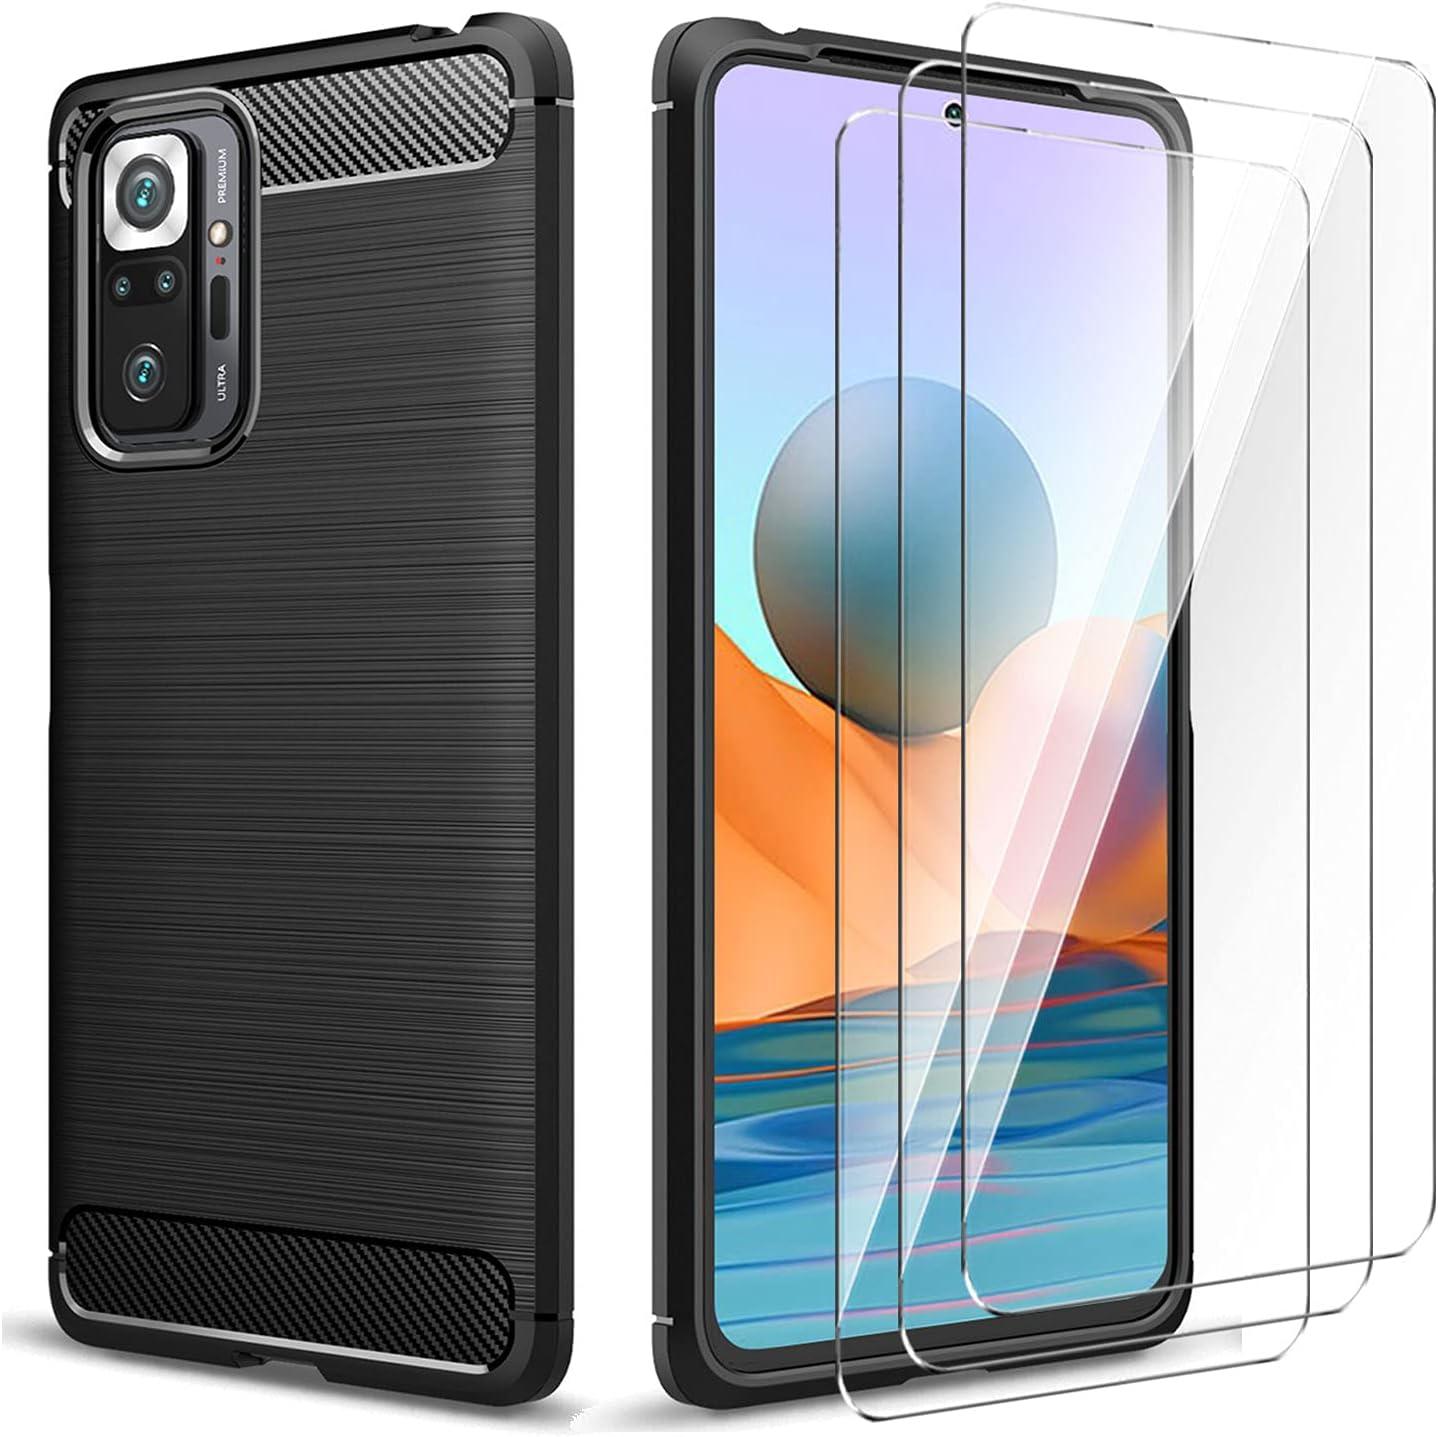 CQiuLi Funda para Xiaomi Redmi Note 10 Pro y 3 Pack Vidrio Templado Protector de Pantalla, Carcasa Cepillada TPU Protector Funda Móvil Ultrafina Cover Case - Negro